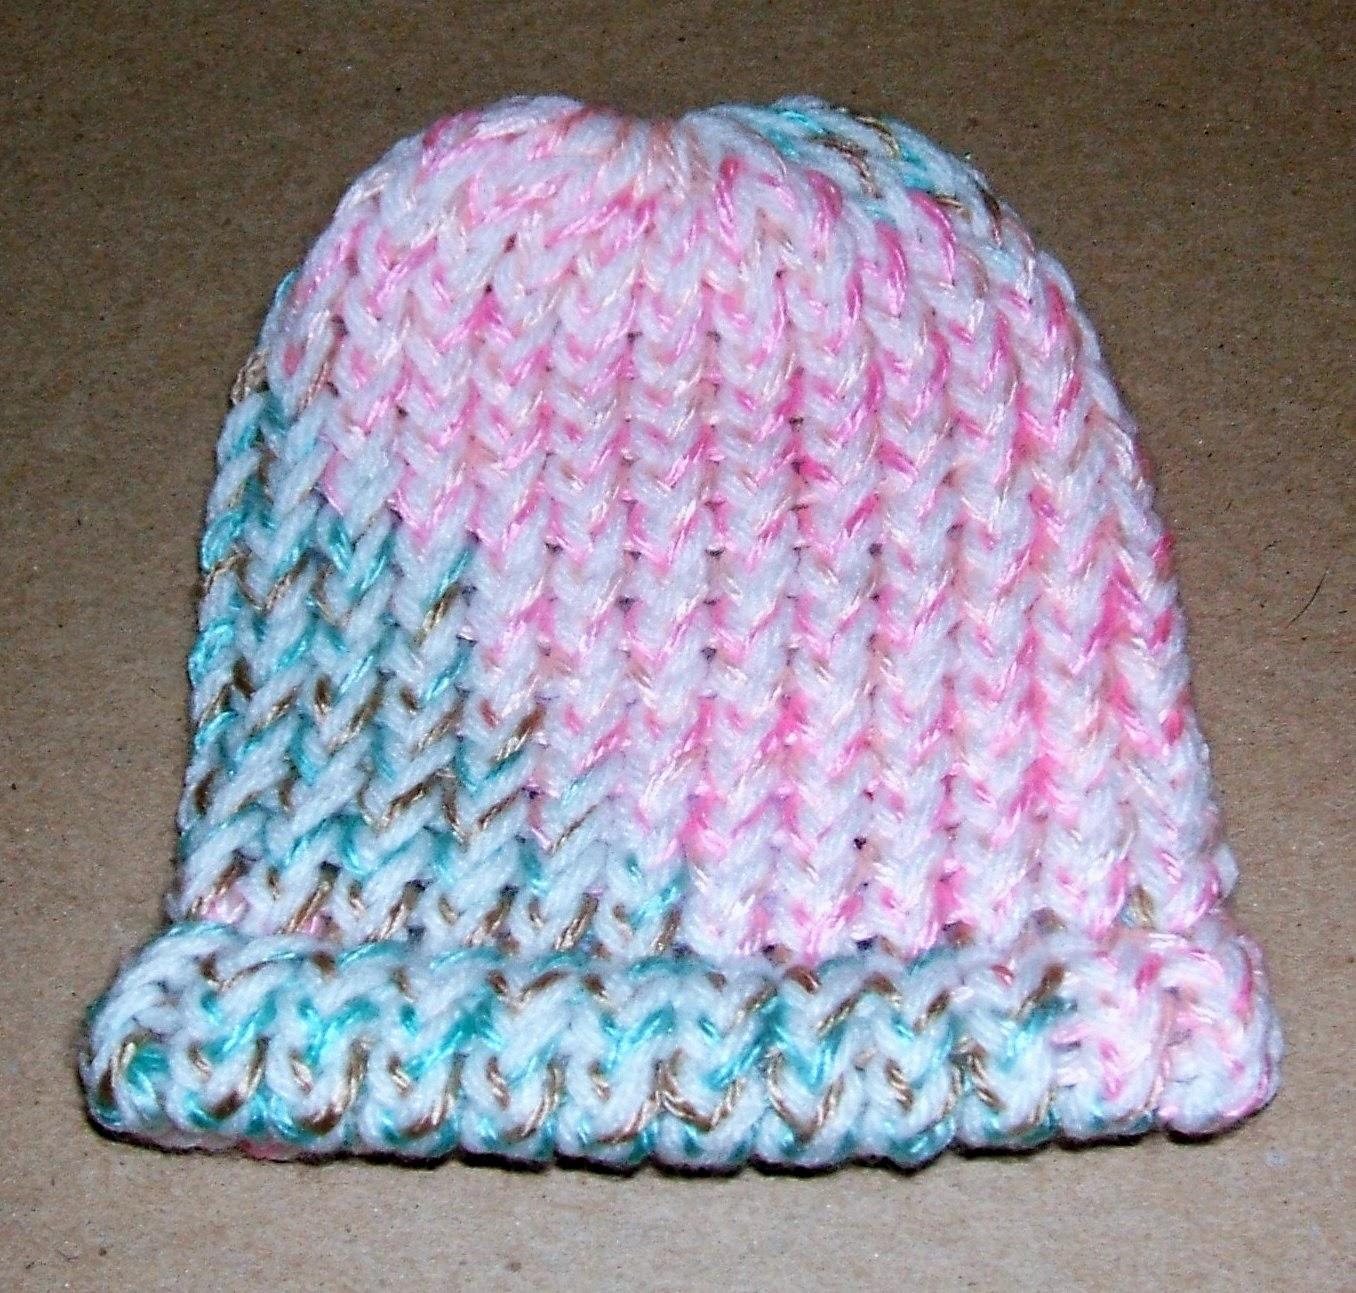 Loom Knitting Baby Hat S : Yolanda s creations crochet hats for everyone